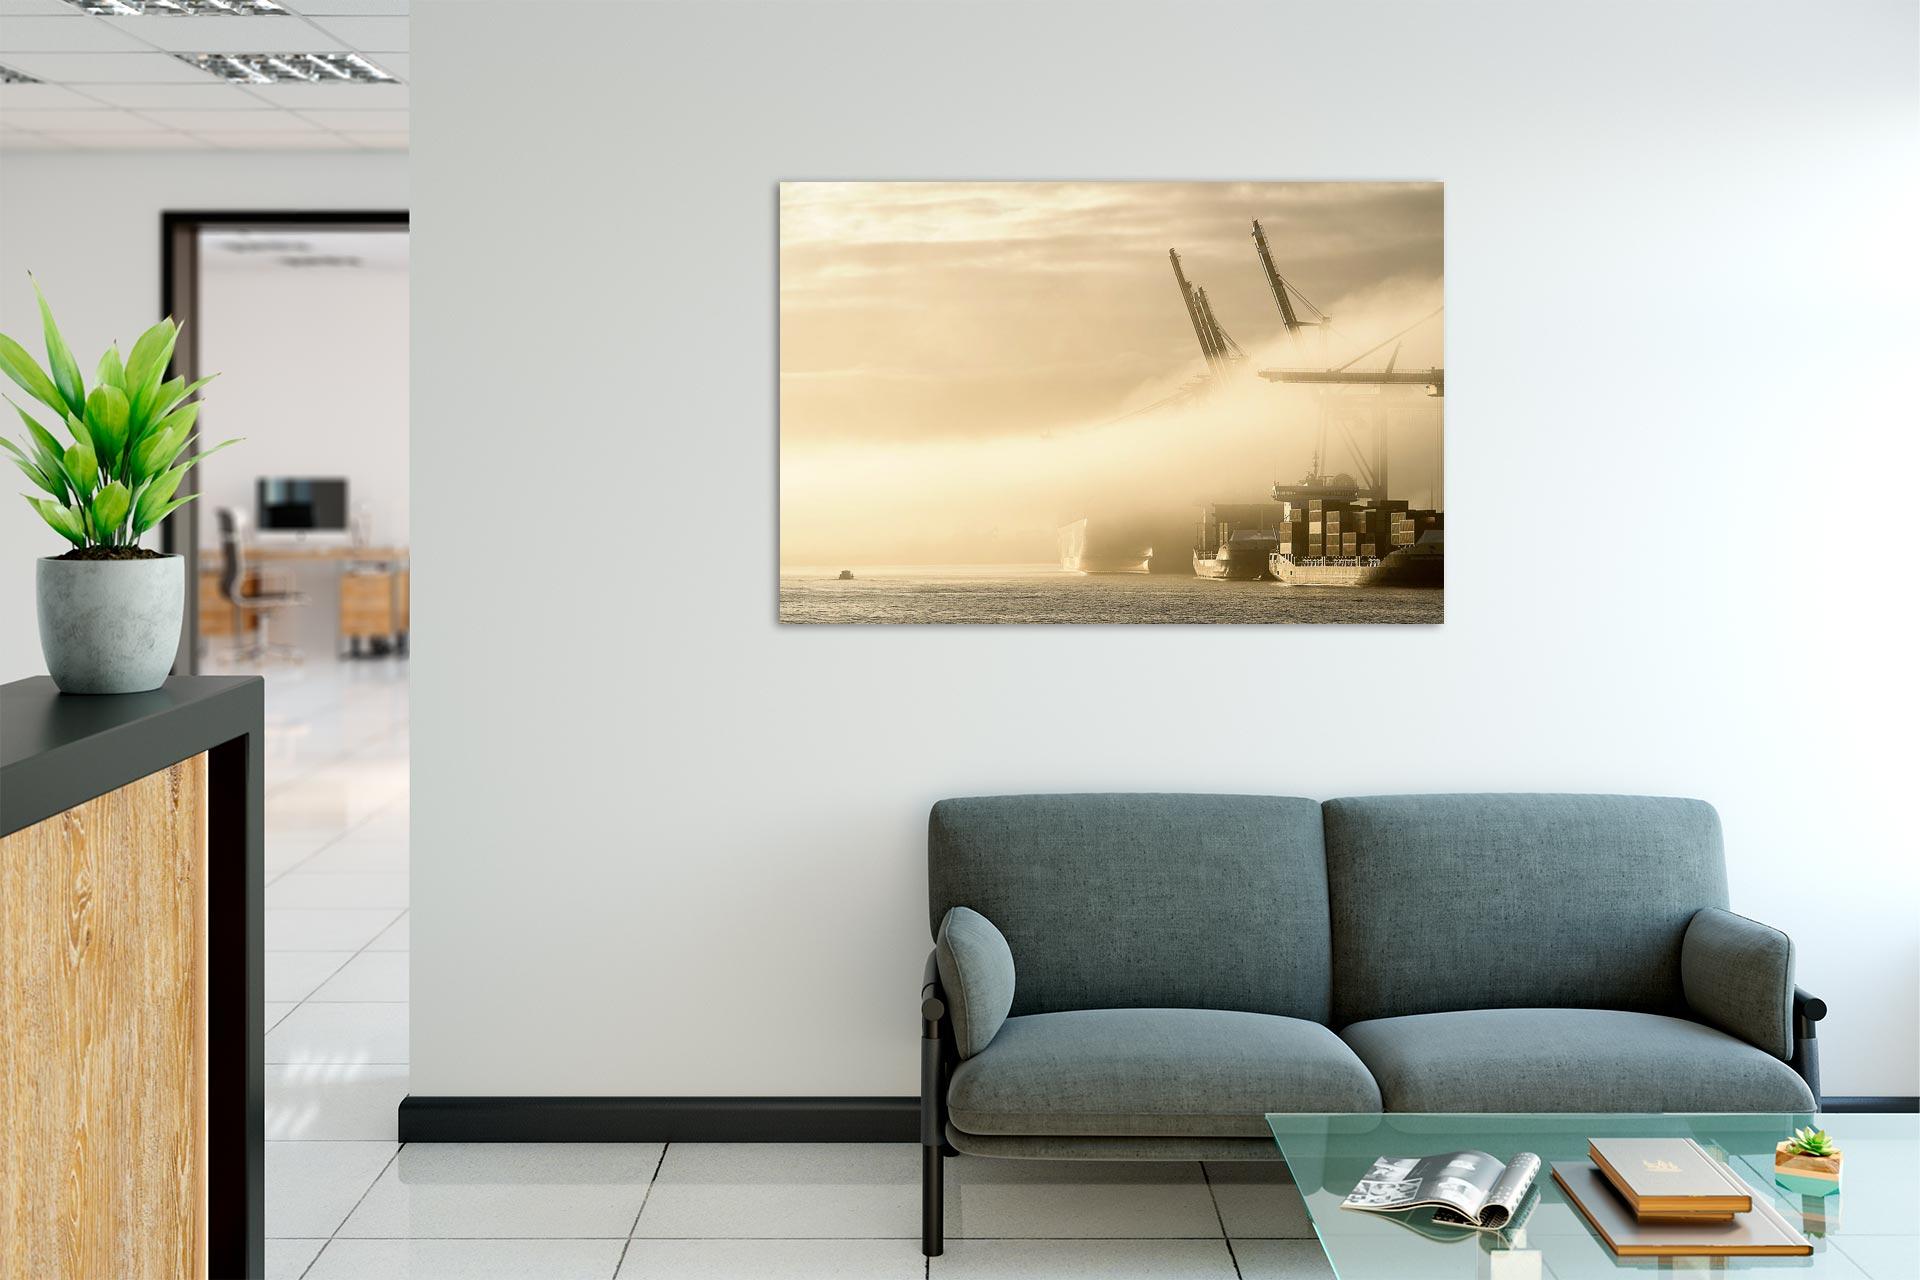 LCW229-hamburg-wandbild-bild-auf-leinwand-acrylglas-aludibond-empfang